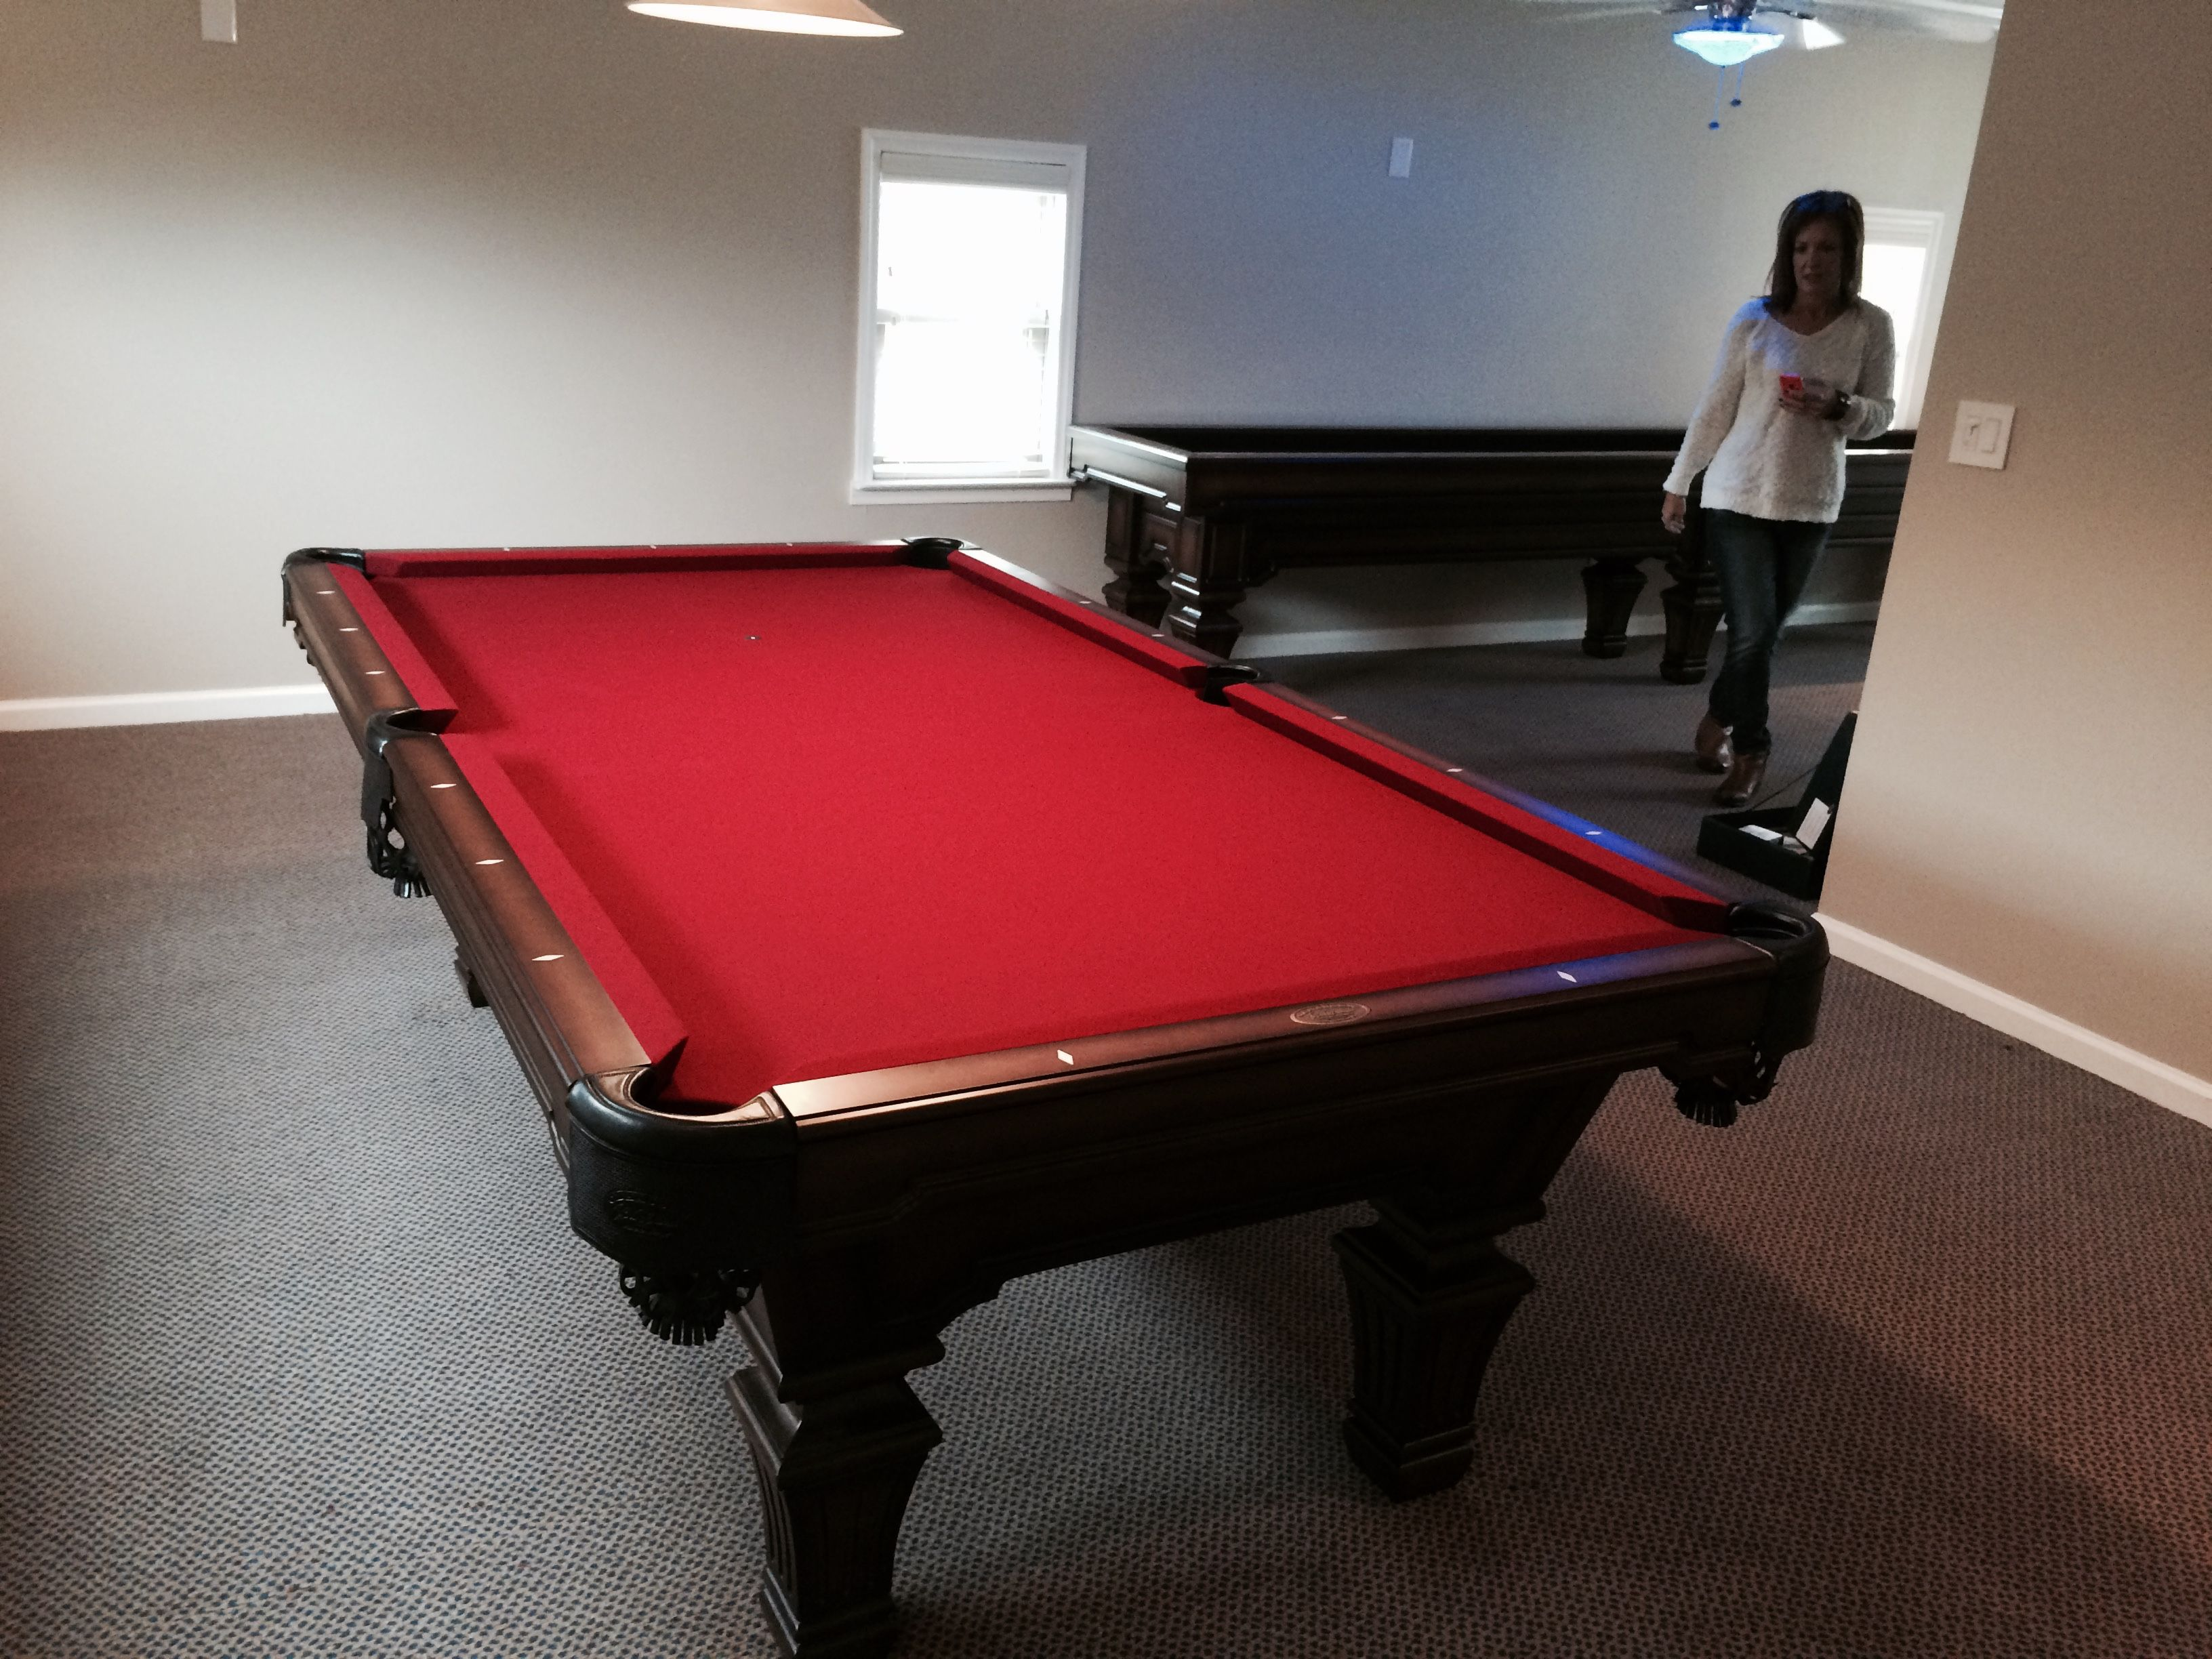 Olhausen Hampton Pool Table And Matching Shuffleboard From - Olhausen hampton pool table